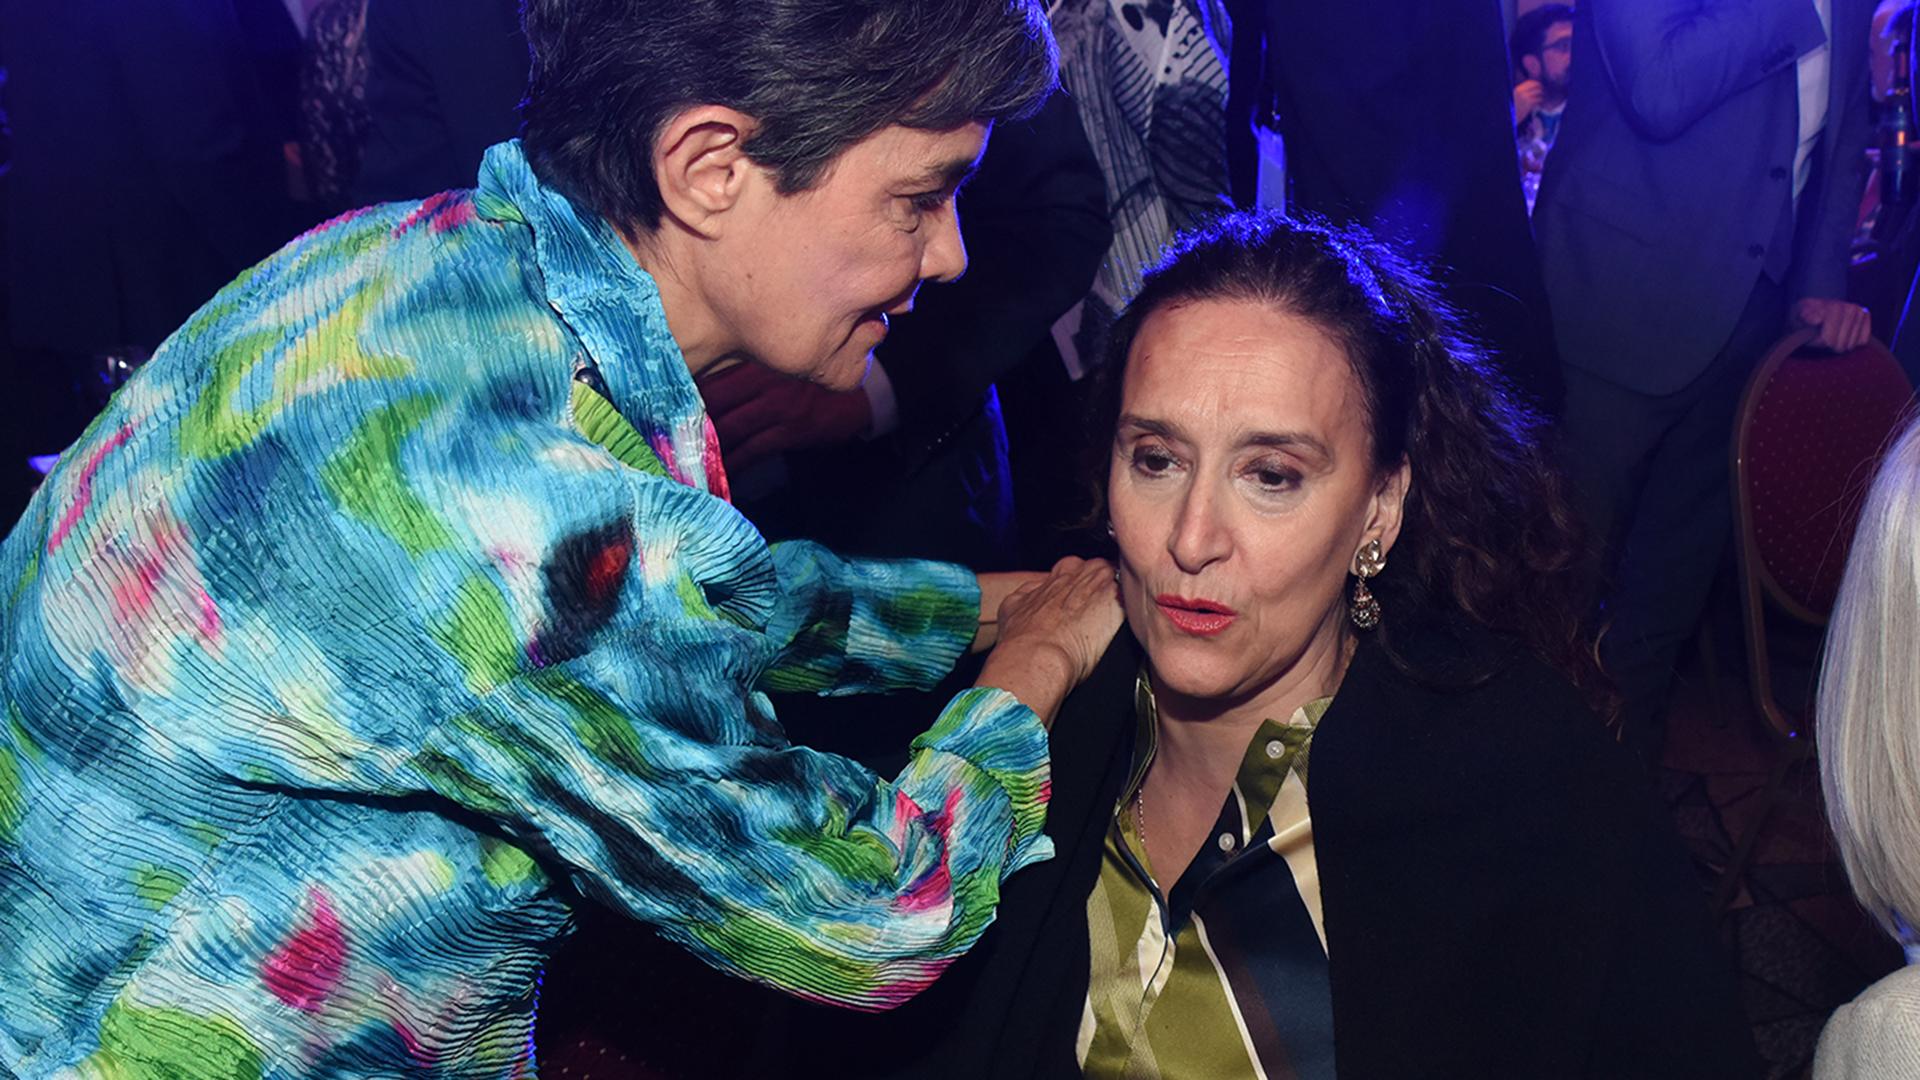 La ex senadora María Eugenia Estenssoro y la vicepresidente Gabriela Michetti